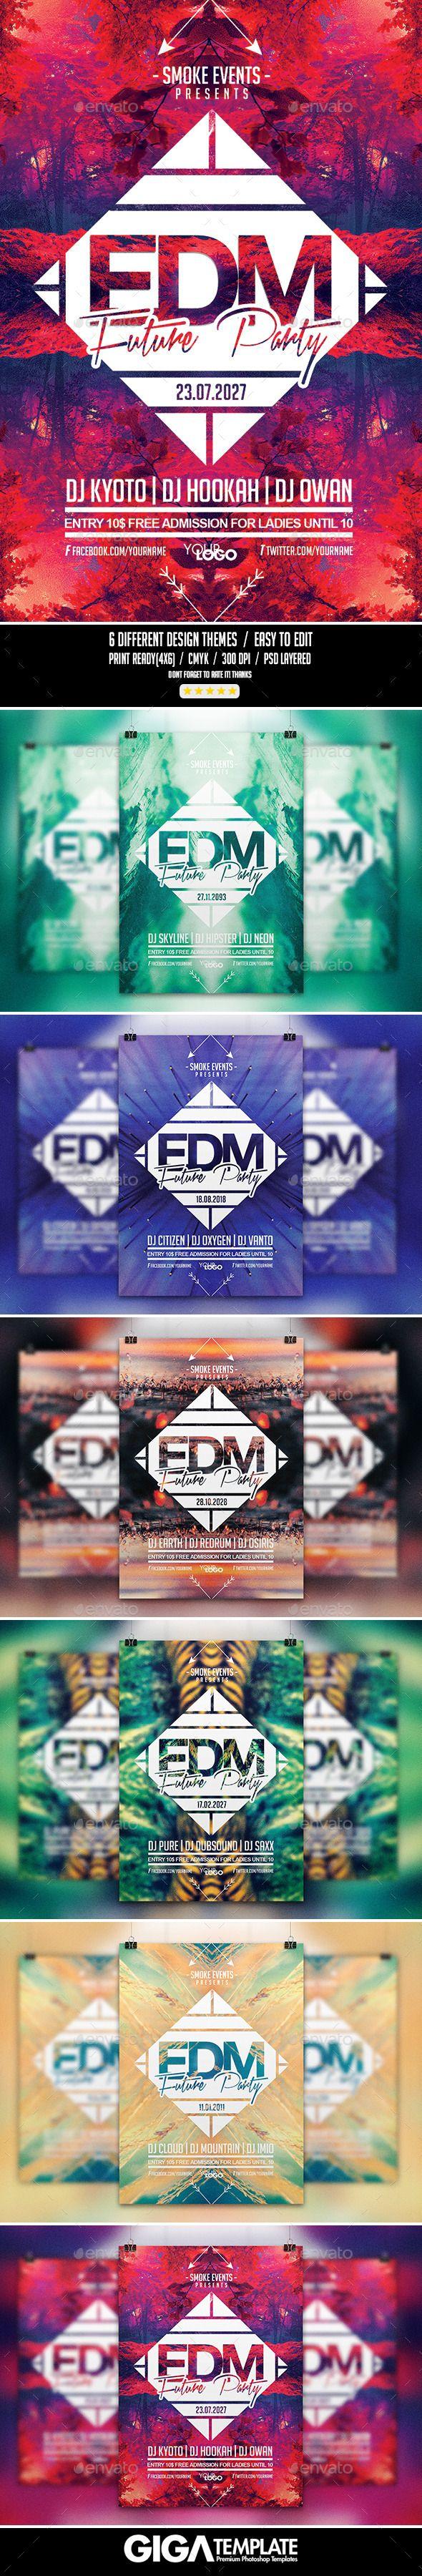 EDM Futuristic Music | Night Flyer PSD Template (CS, 4x6, abstract, alternative, bundle, colorful, deejay, drum n bass, drumnbass, dubstep, edm, electro, electronic, elemental, event, festival, future, futuristic, geometric, minimal, minimalist, modern flyer, music, nature, night, party, print template, progressive house, summer, techno poster, trance, urban)